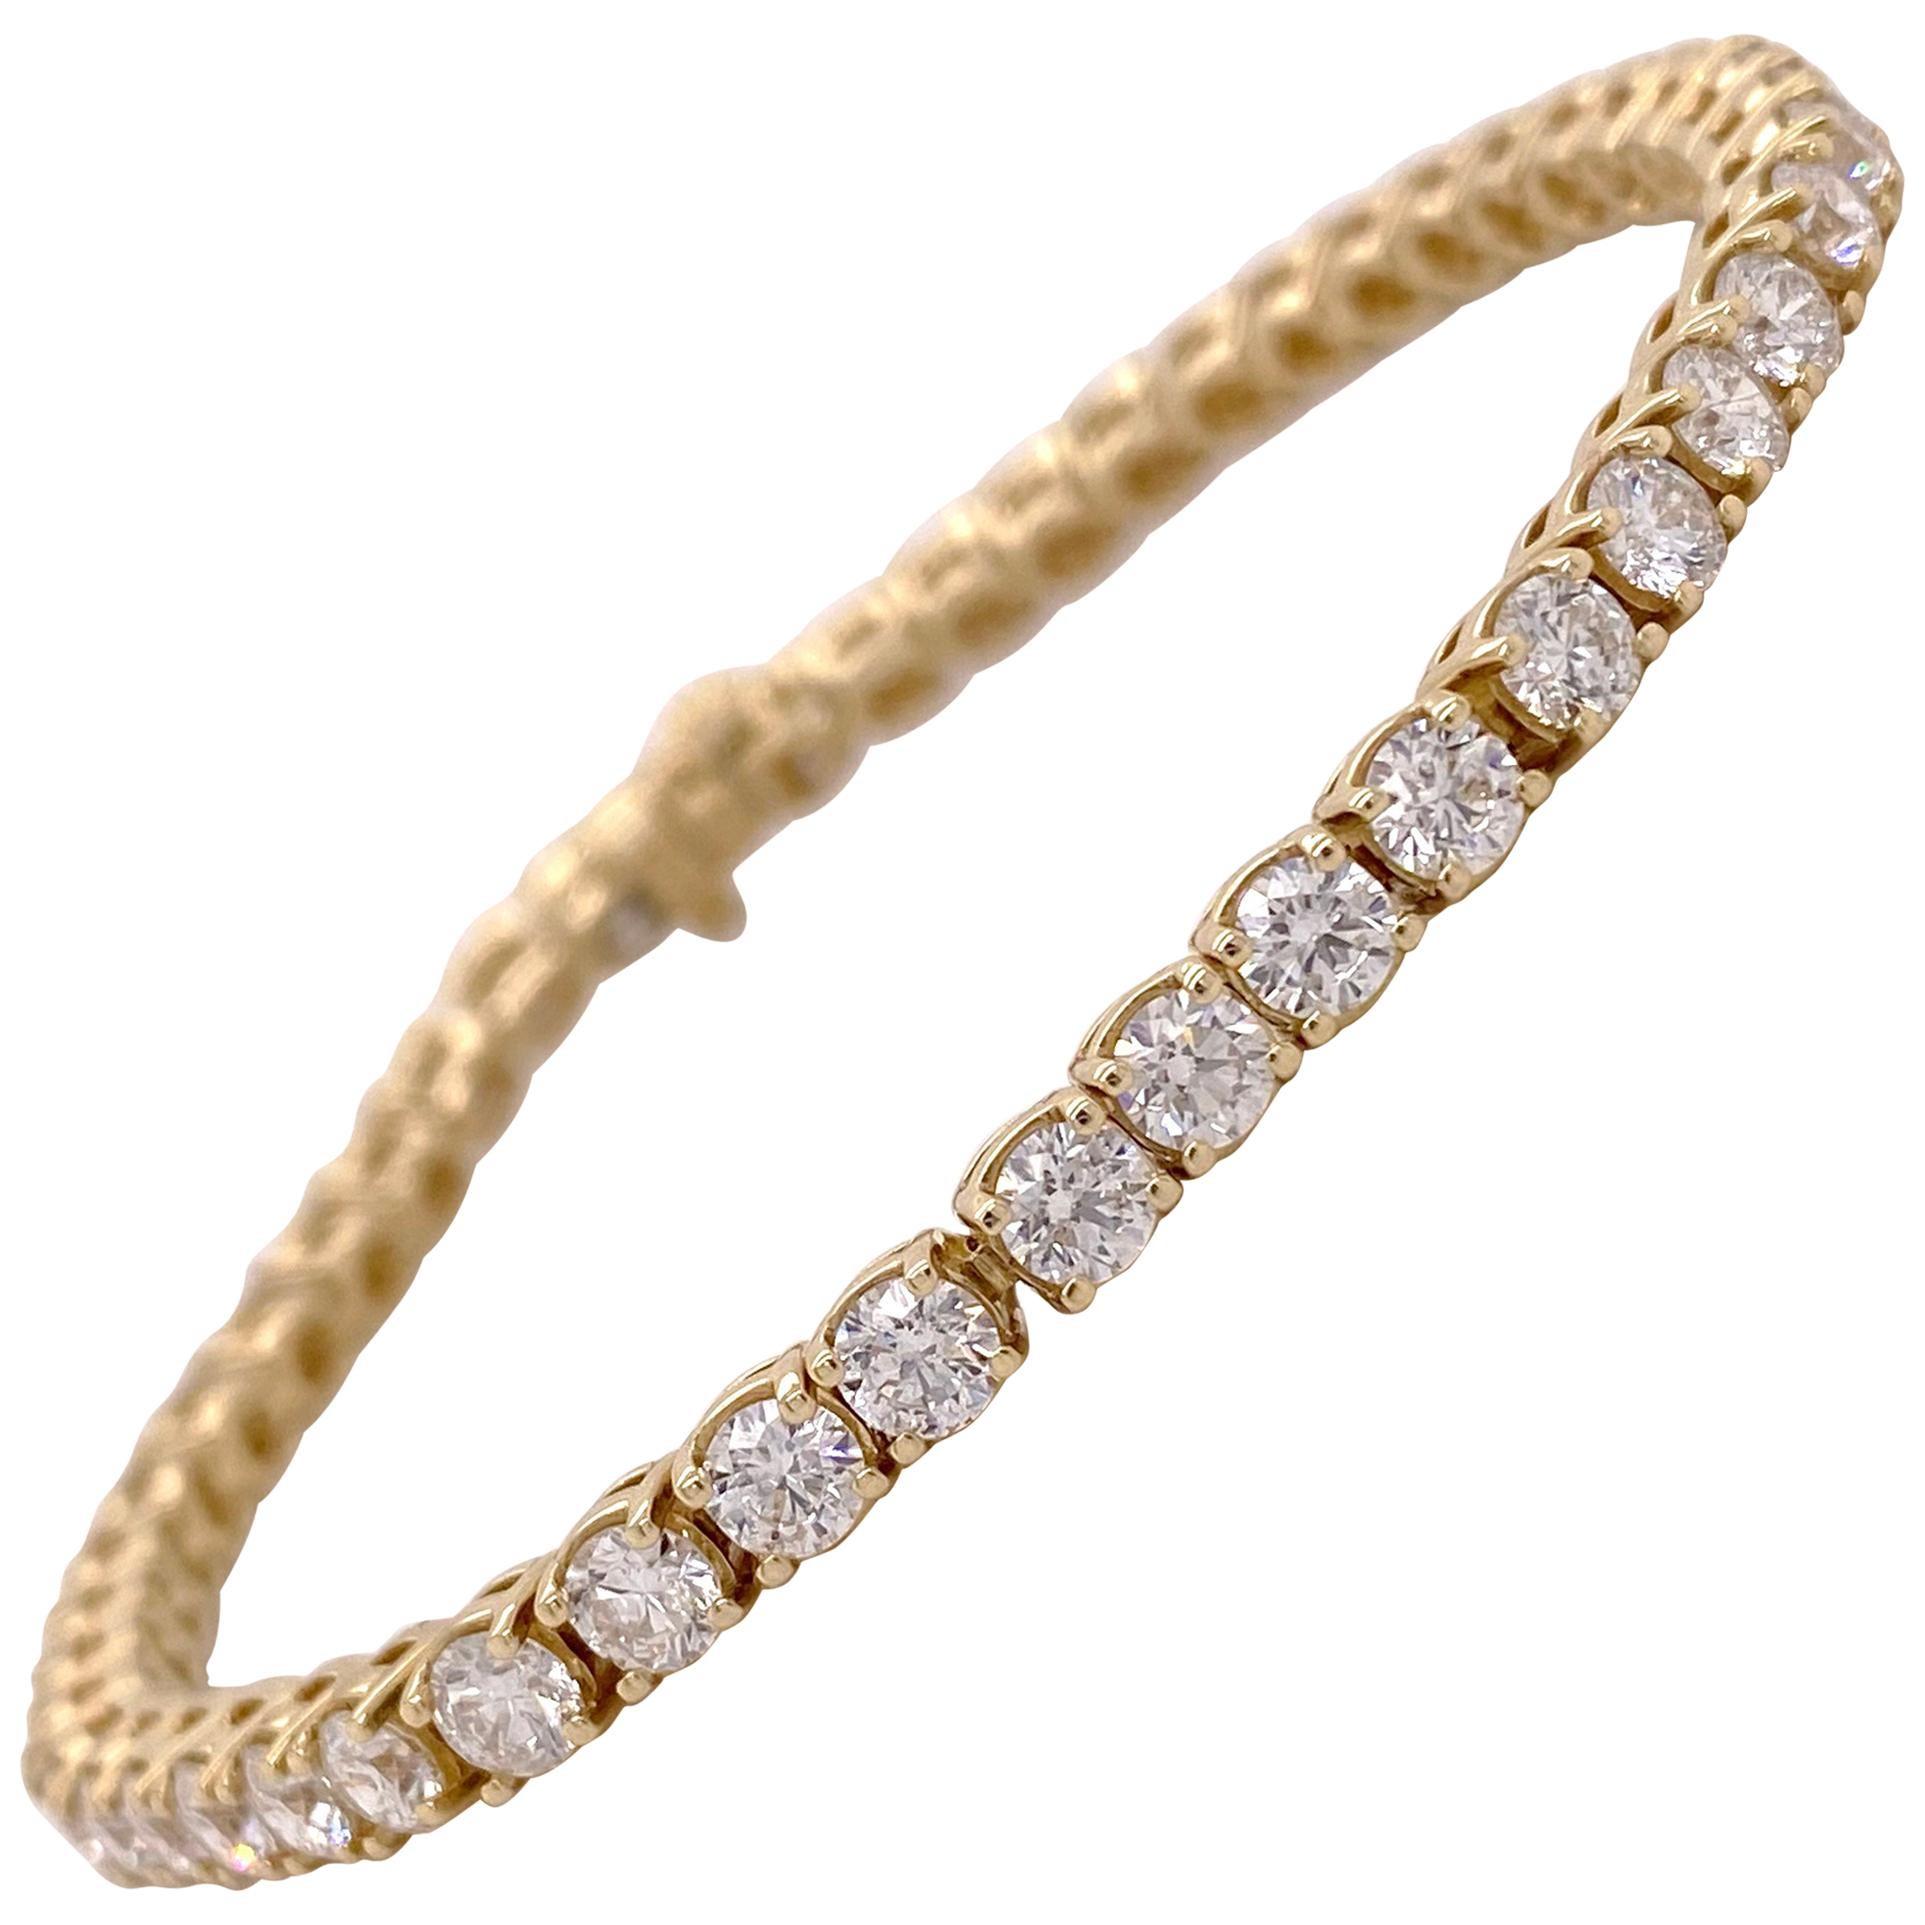 Diamond Tennis Bracelet, 7 Carat Diamond Bracelet, 4 Prong Tennis Bracelet 7 ct